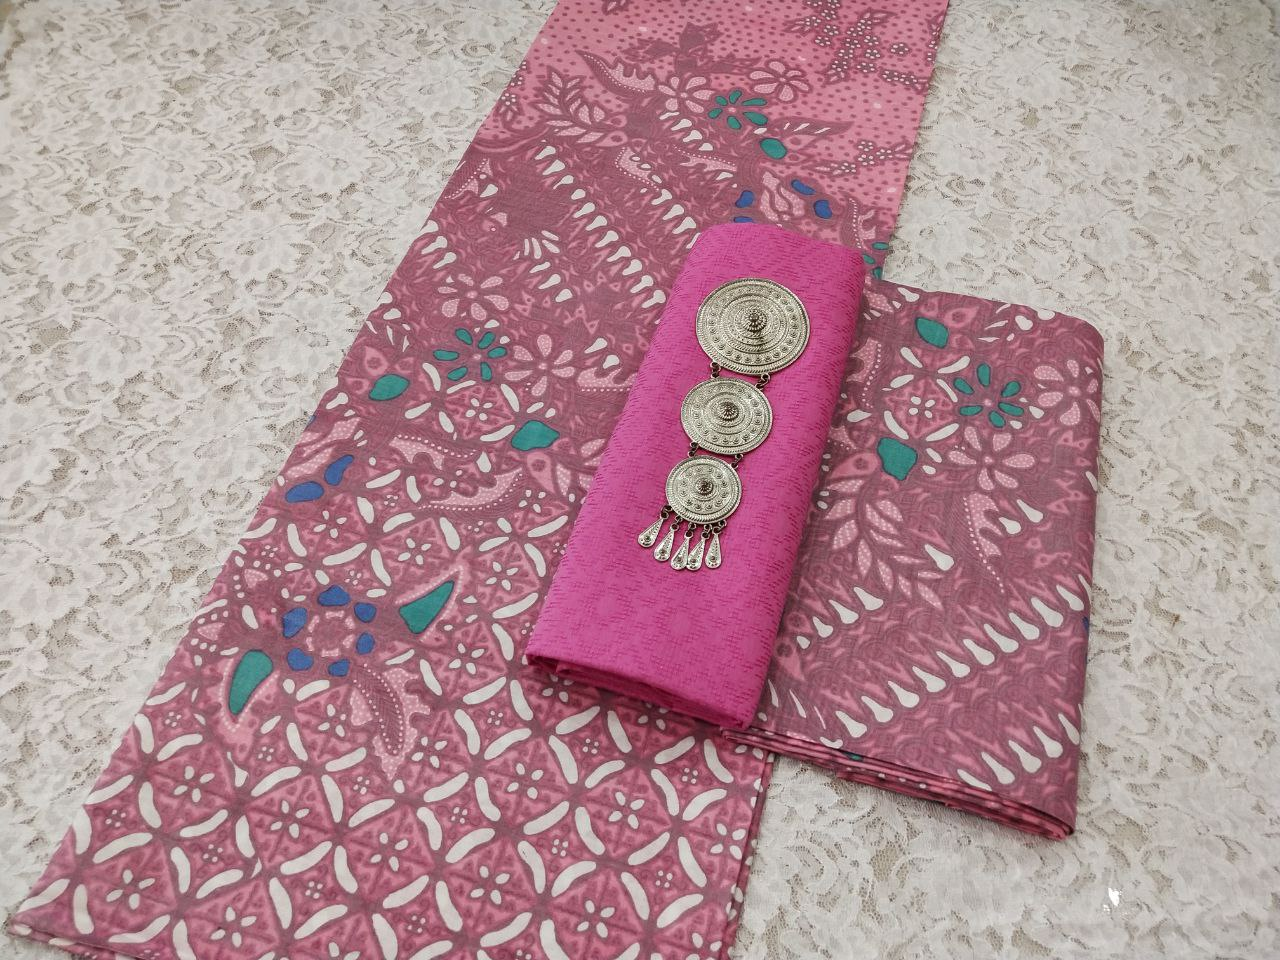 kain batik printing motif terbaik bahan katun